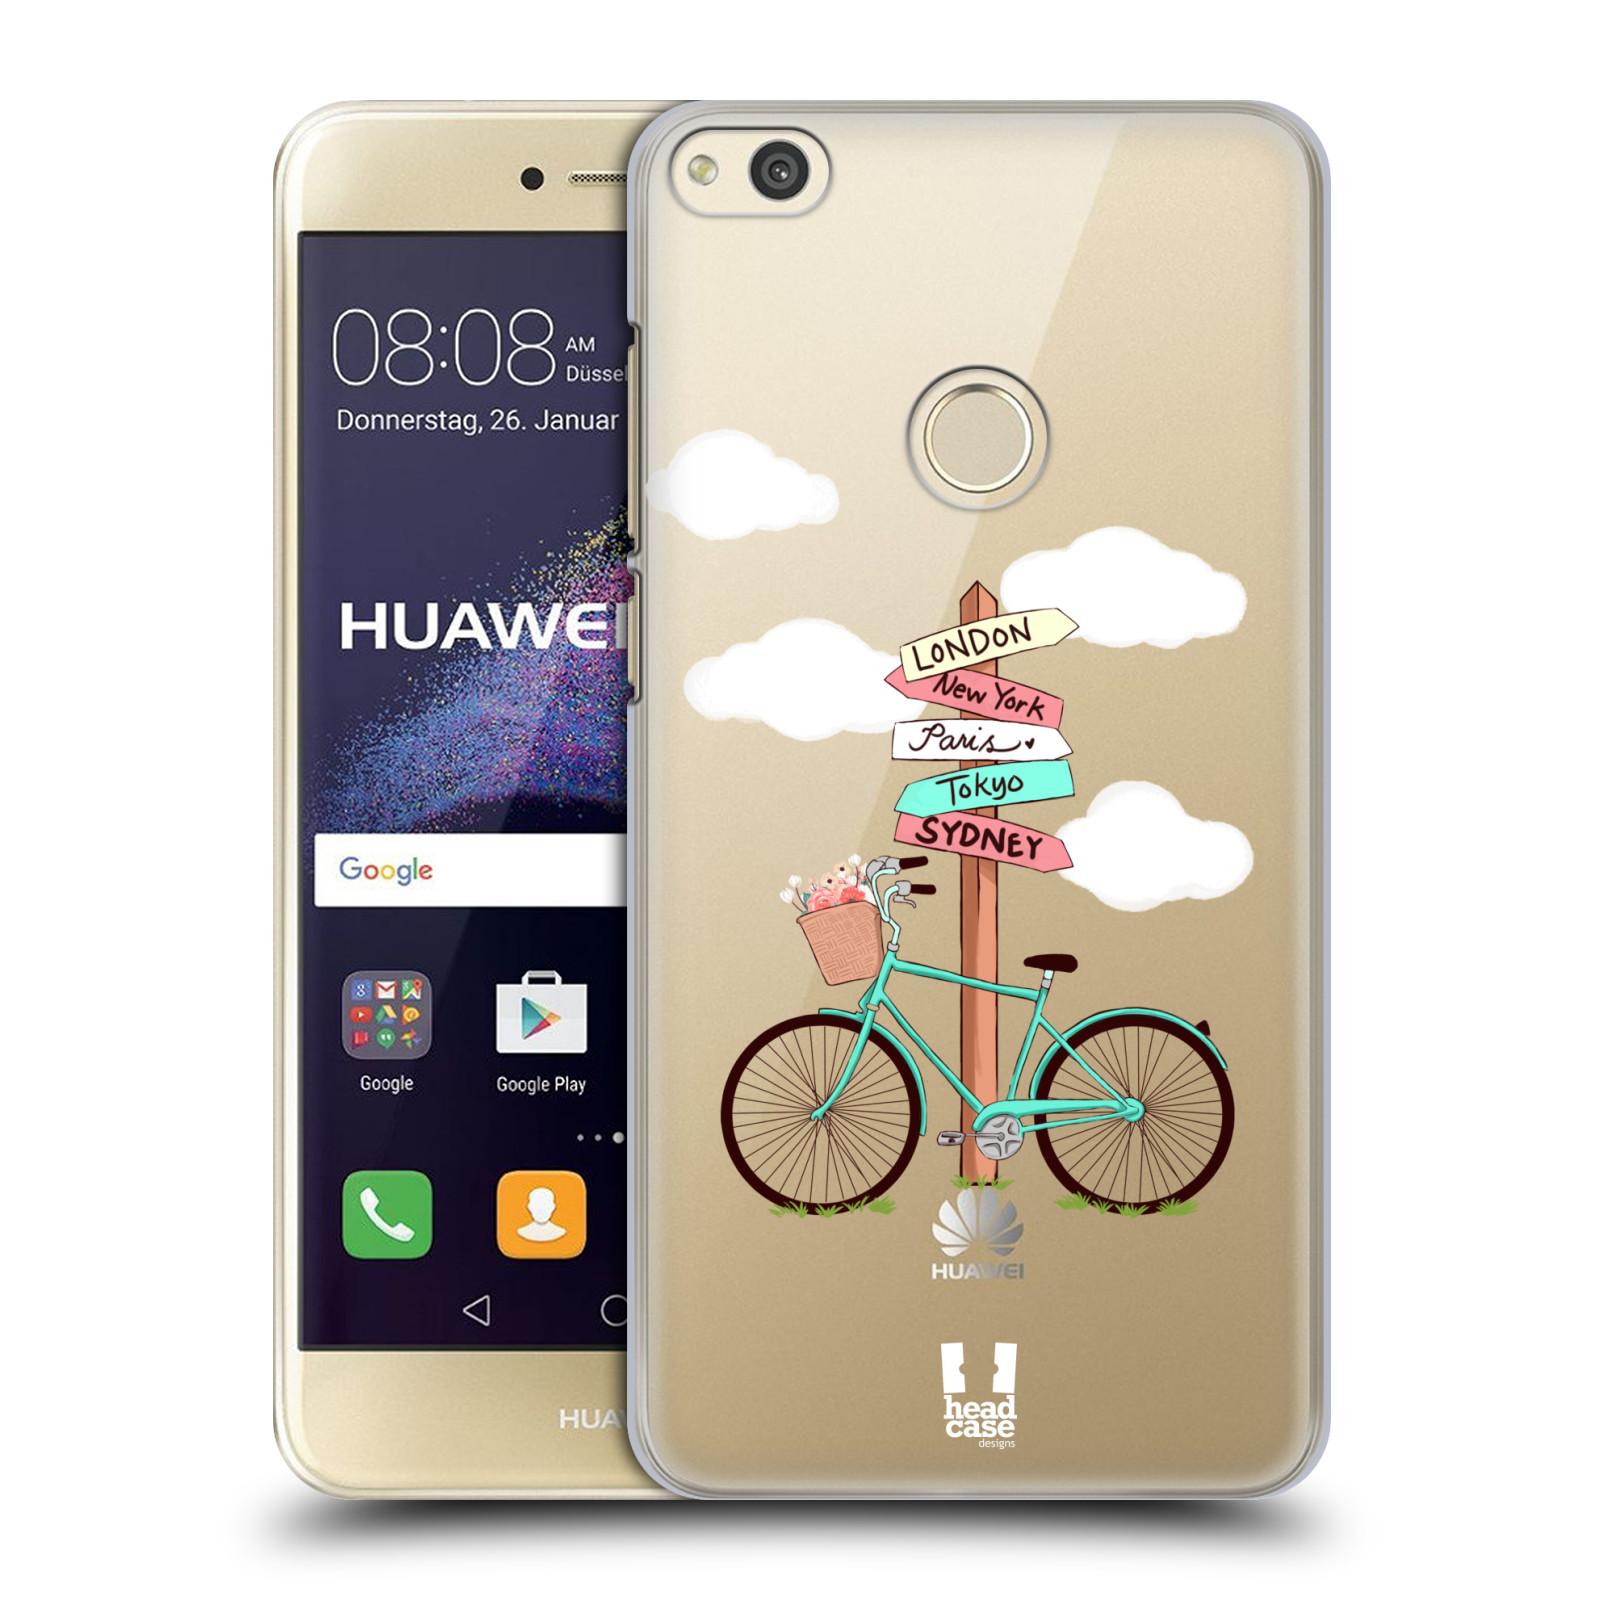 Plastové pouzdro na mobil Huawei P9 Lite (2017) - Head Case - Rozcestník s kolem